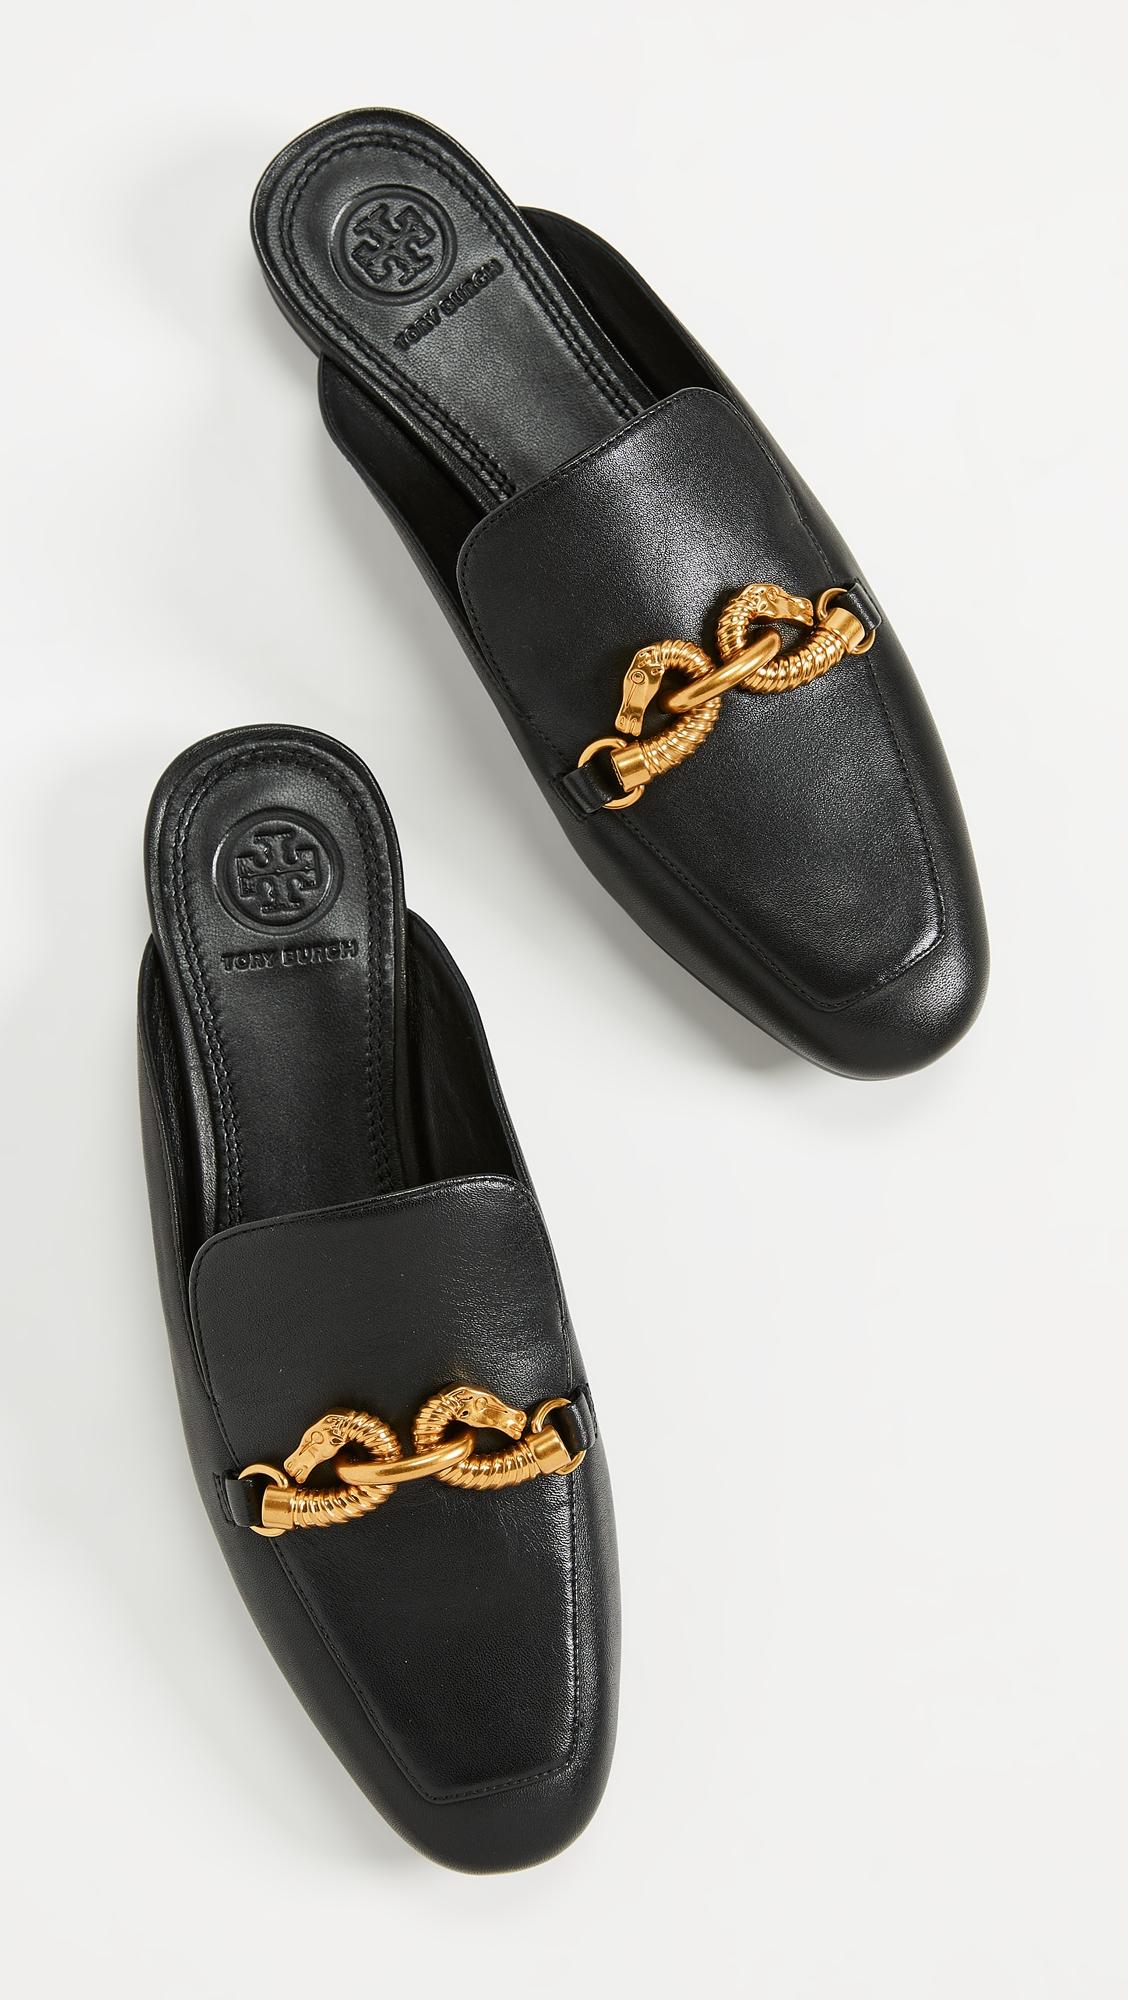 553733af4 Tory Burch Jessa Backless Loafers